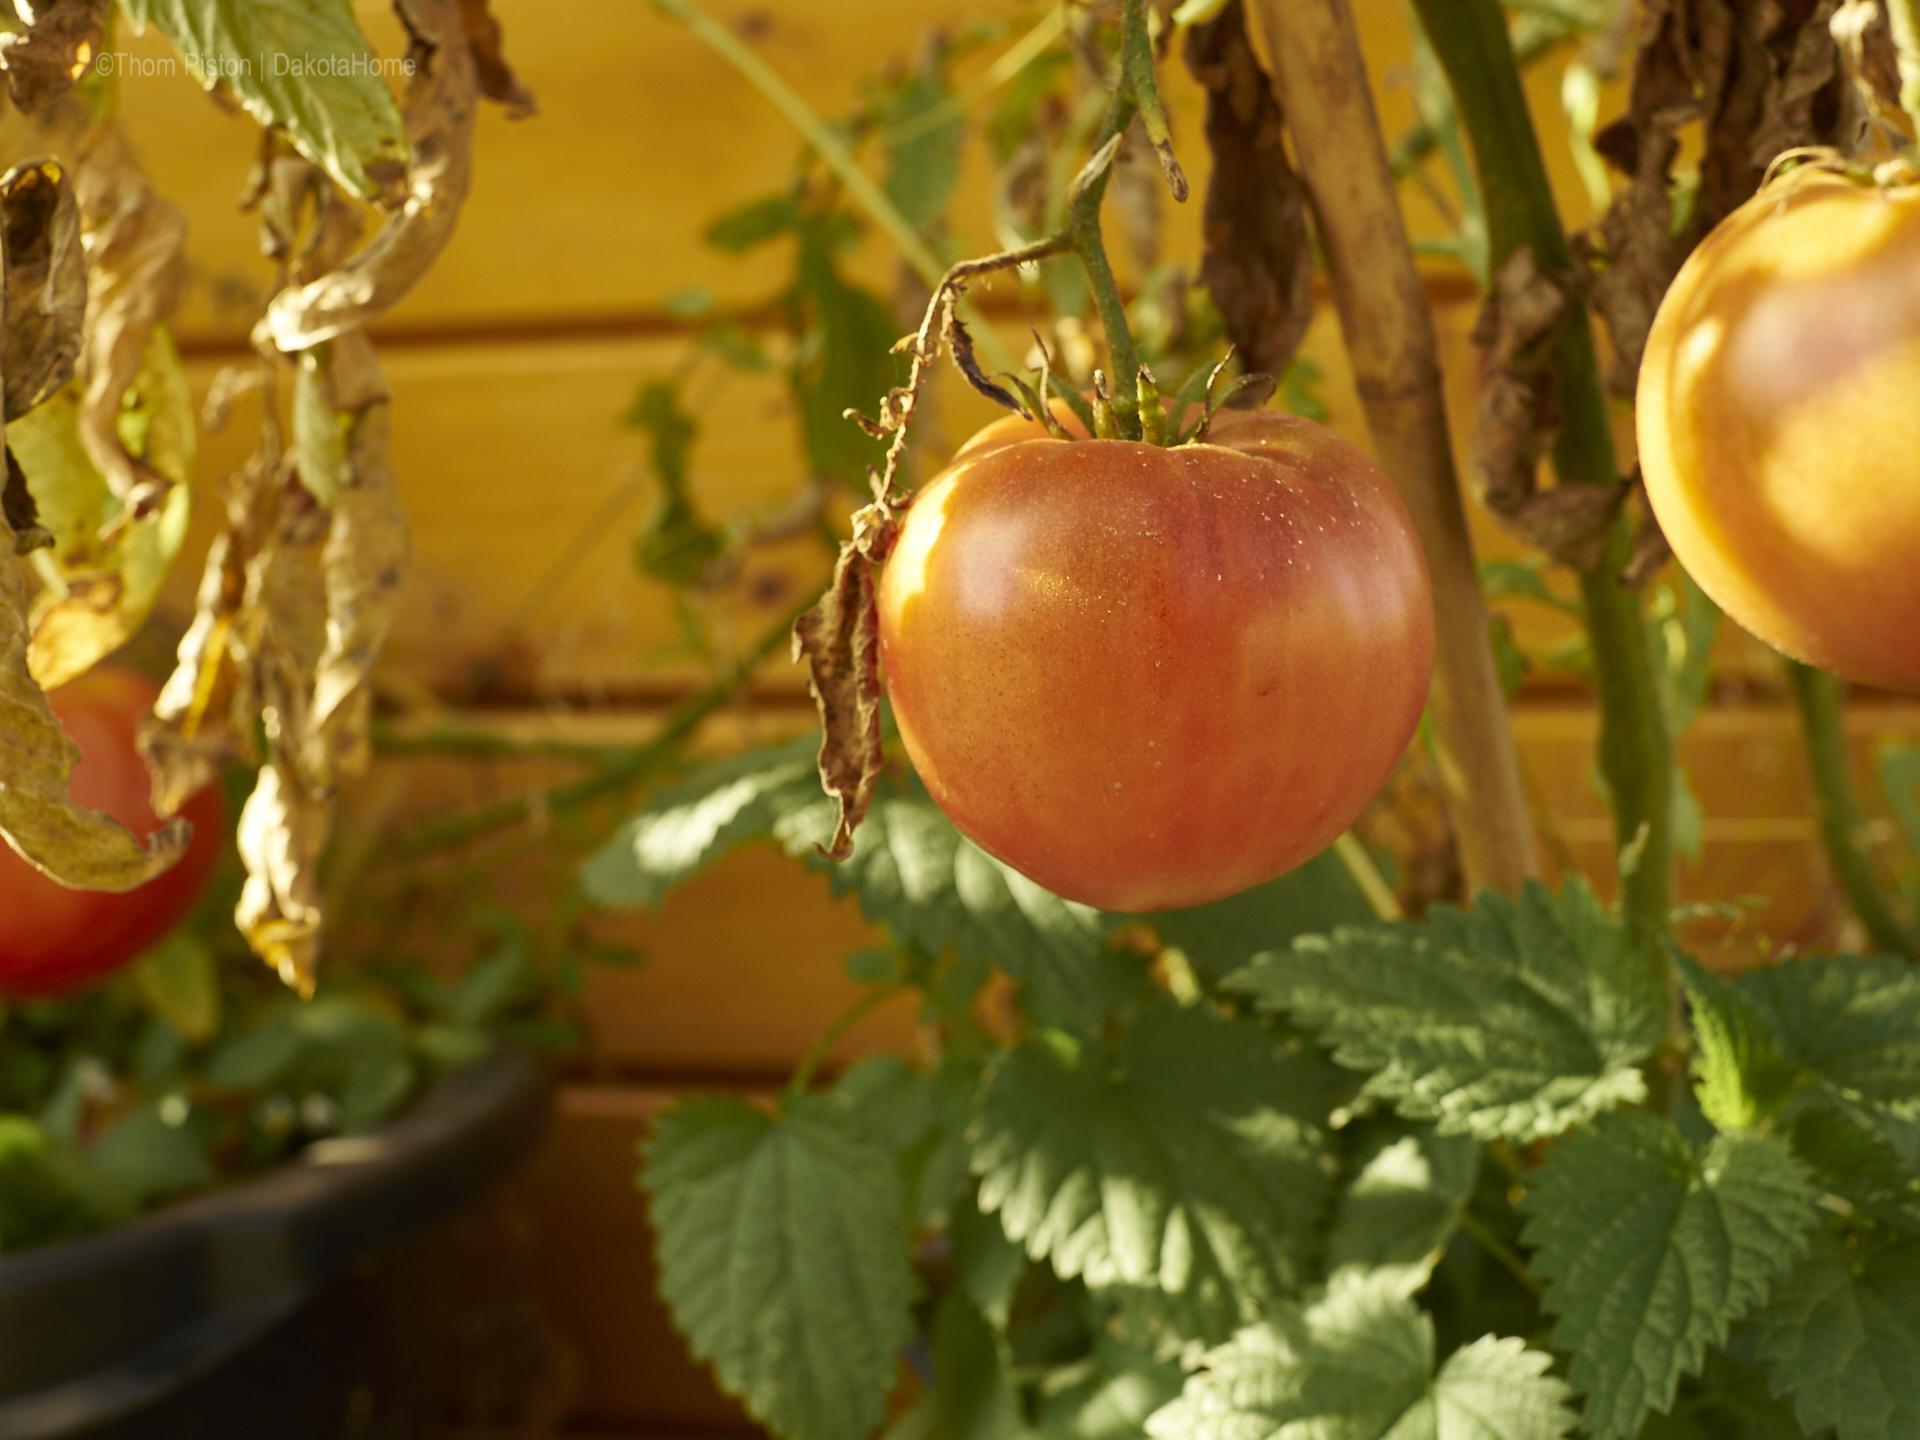 Tomaten, Ende Oktober 2018, Dakota Home